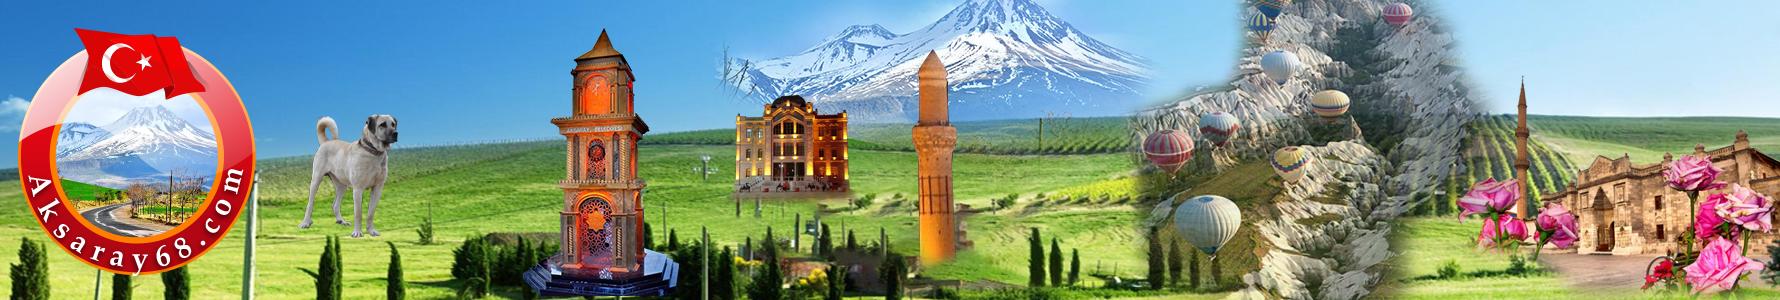 68 Aksaray Forum , Aksaray haberleri ,  Aksaray sohbet